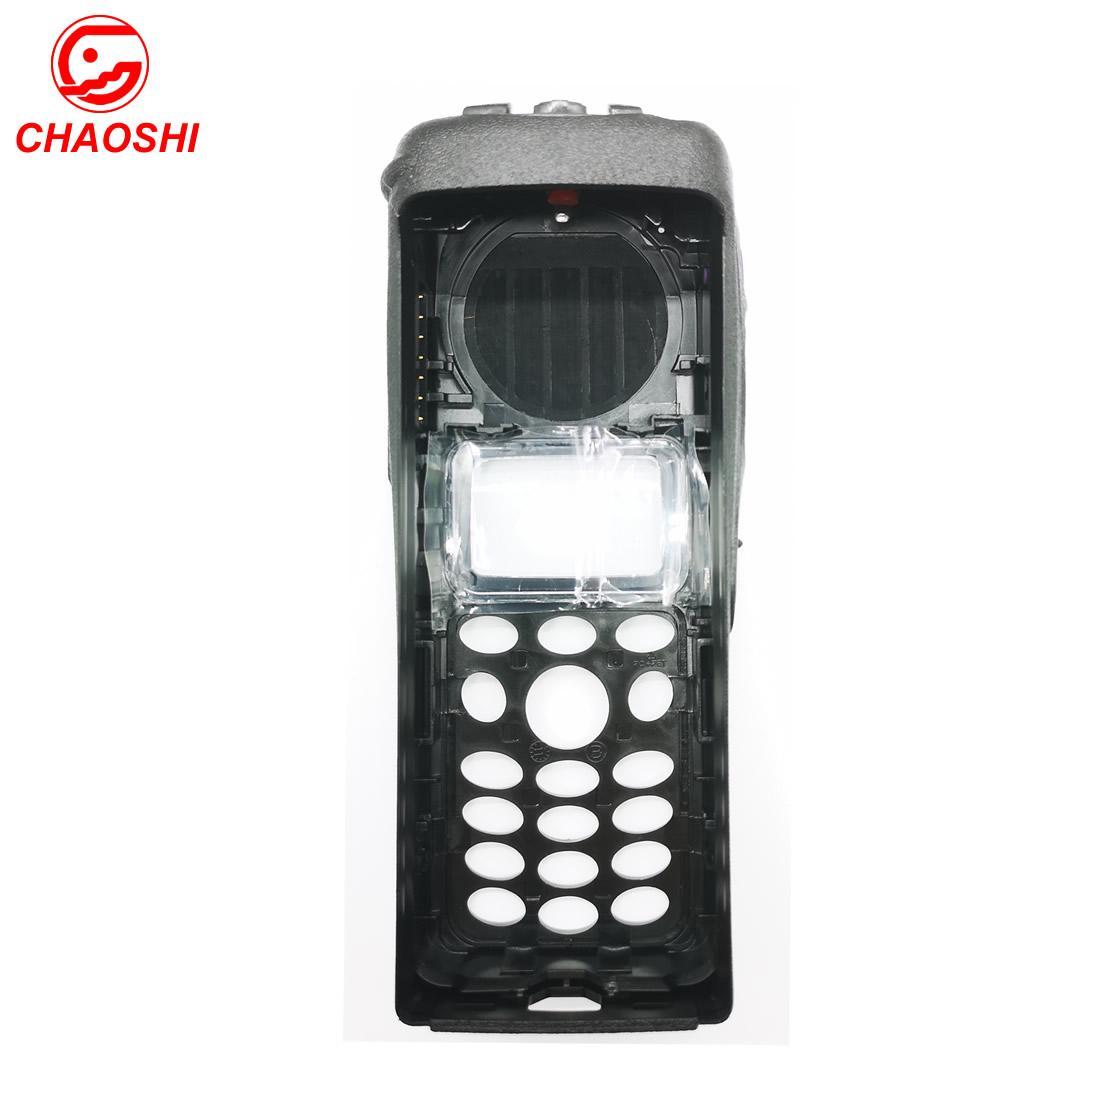 XTS2500對講機面殼1585746D03 4